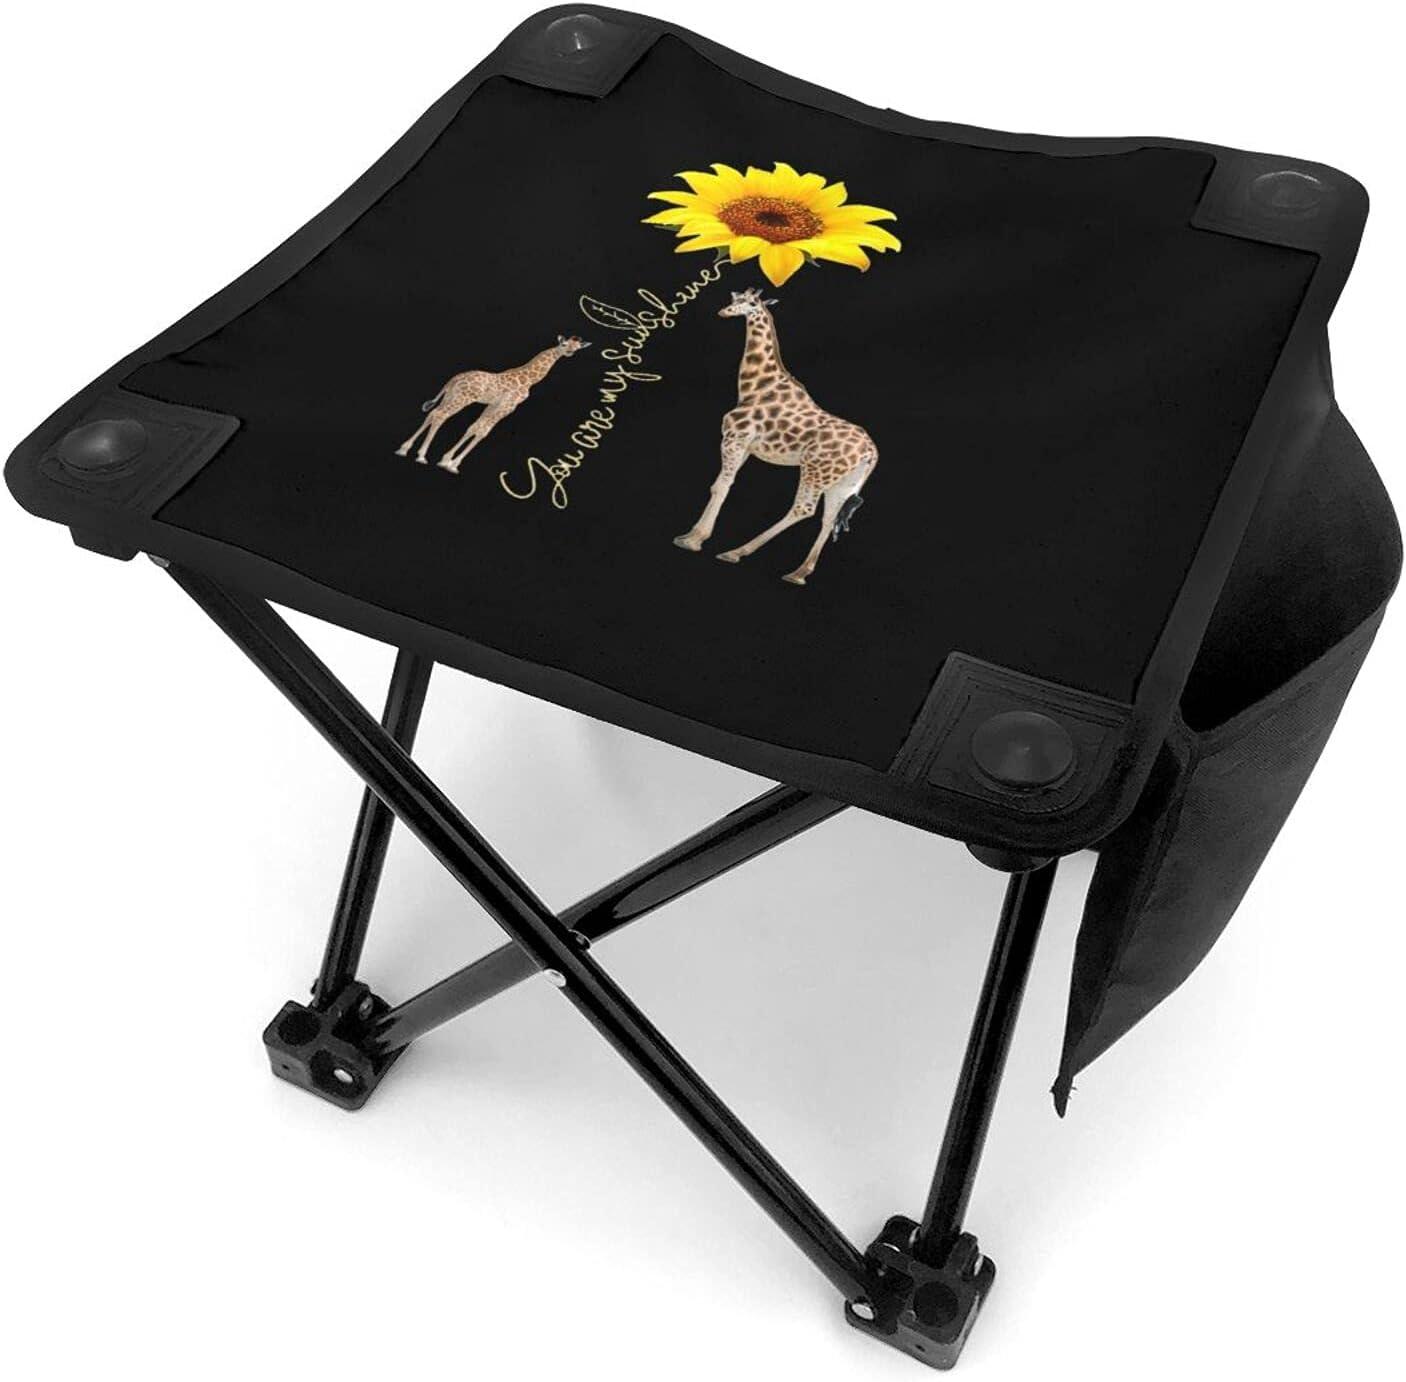 25% OFF Giraffe You are My Bargain Sunshine Ultralight P Stool Camping Sunflower